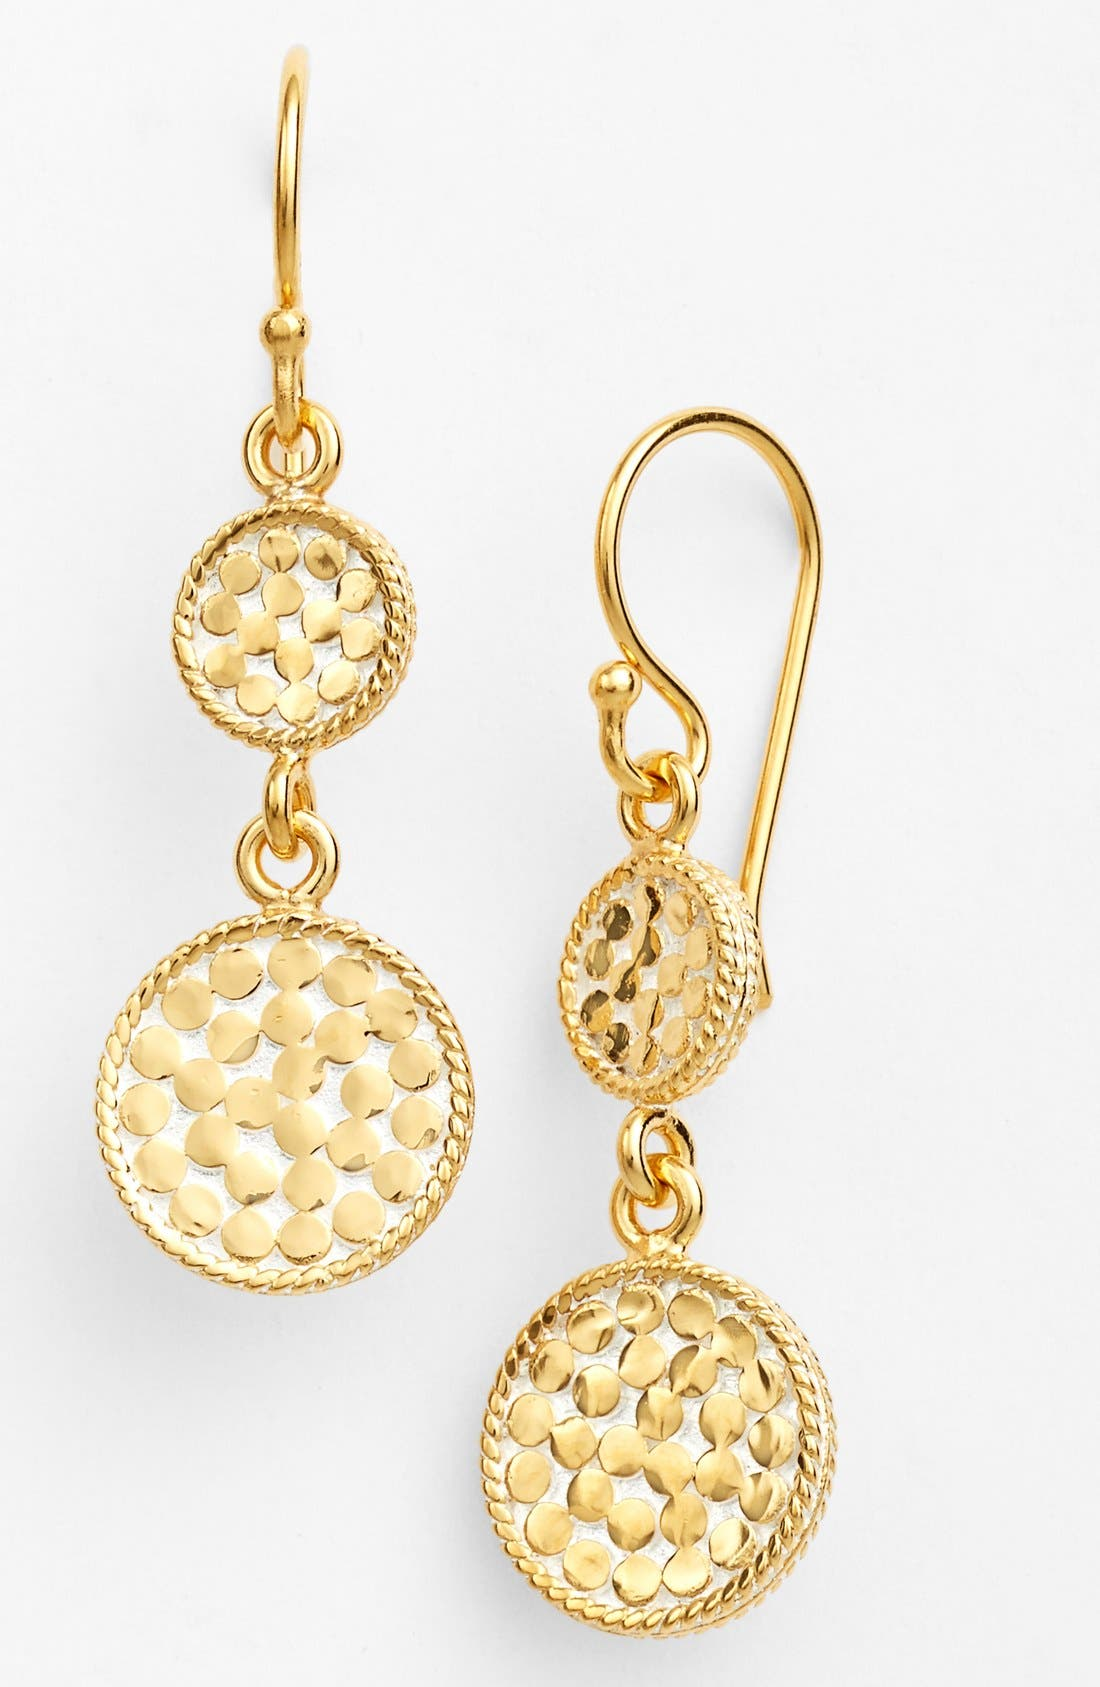 Main Image - Anna Beck 'Gili' Drop Earrings